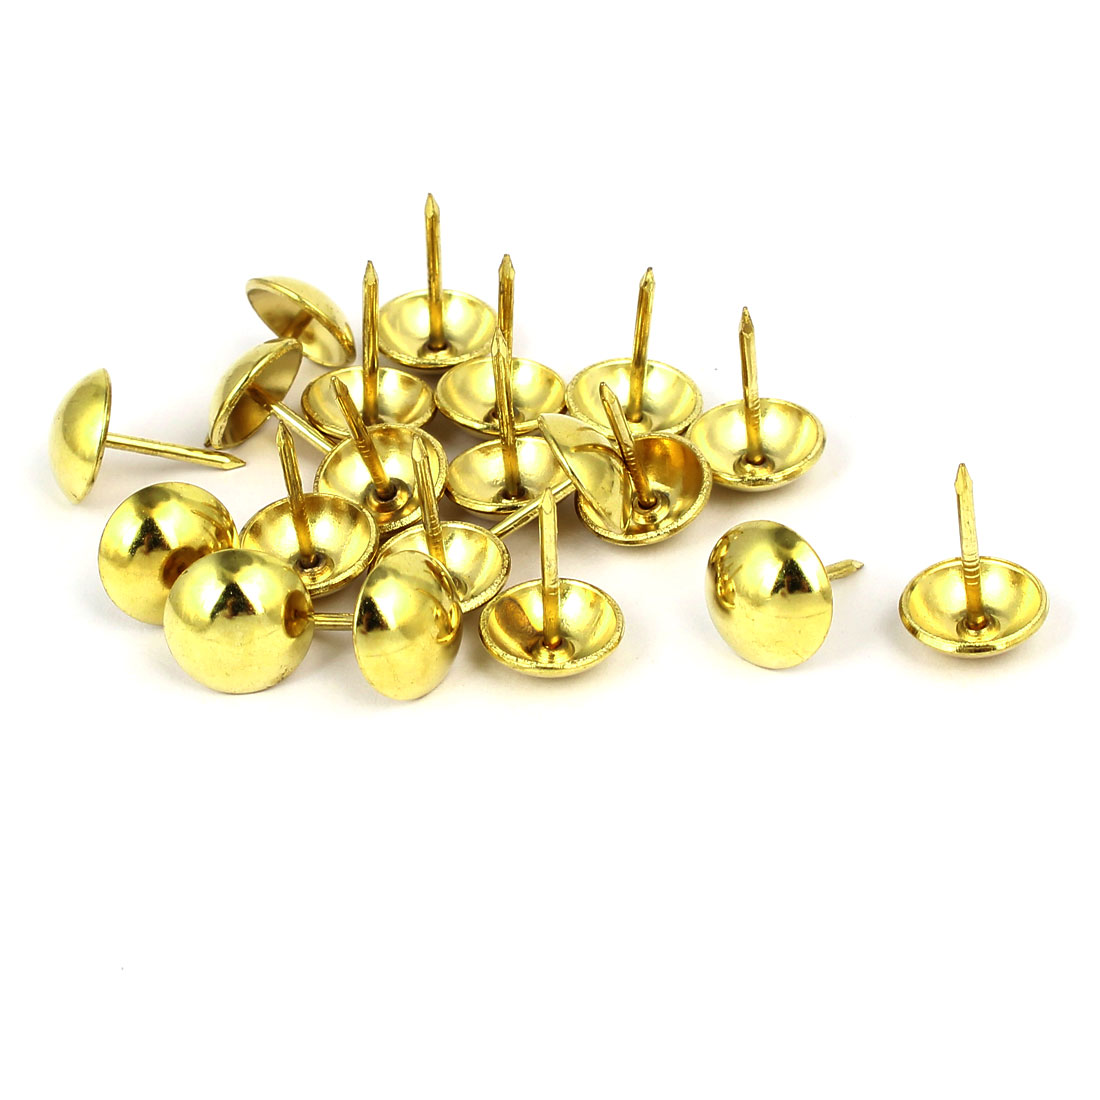 Home Furniture Upholstery Thumb Tack Nail Push Pin Gold Tone 12mm x 17mm 20pcs